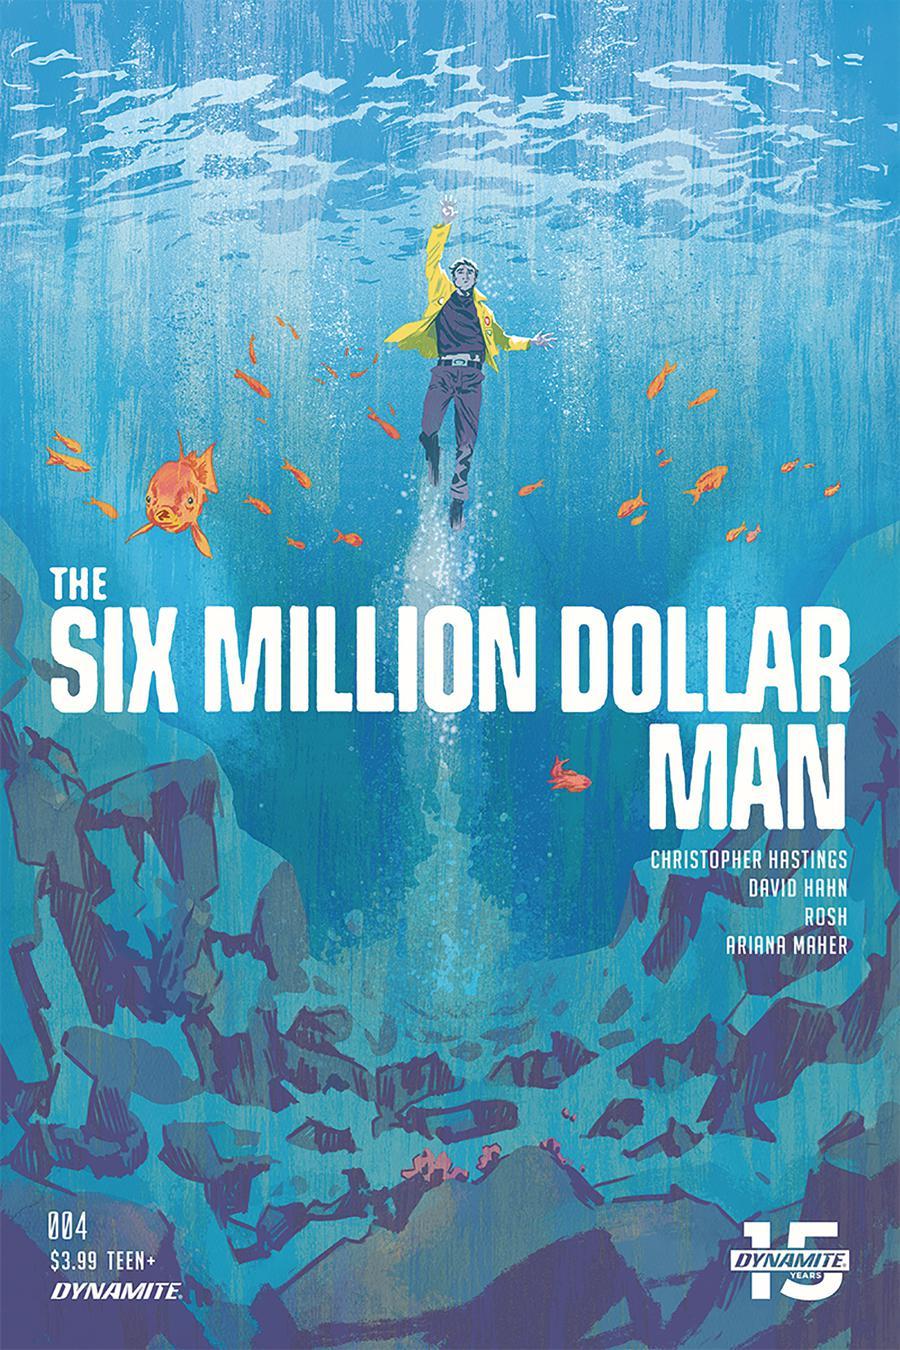 Six Million Dollar Man Vol 2 #4 Cover A Regular Michael Walsh Cover